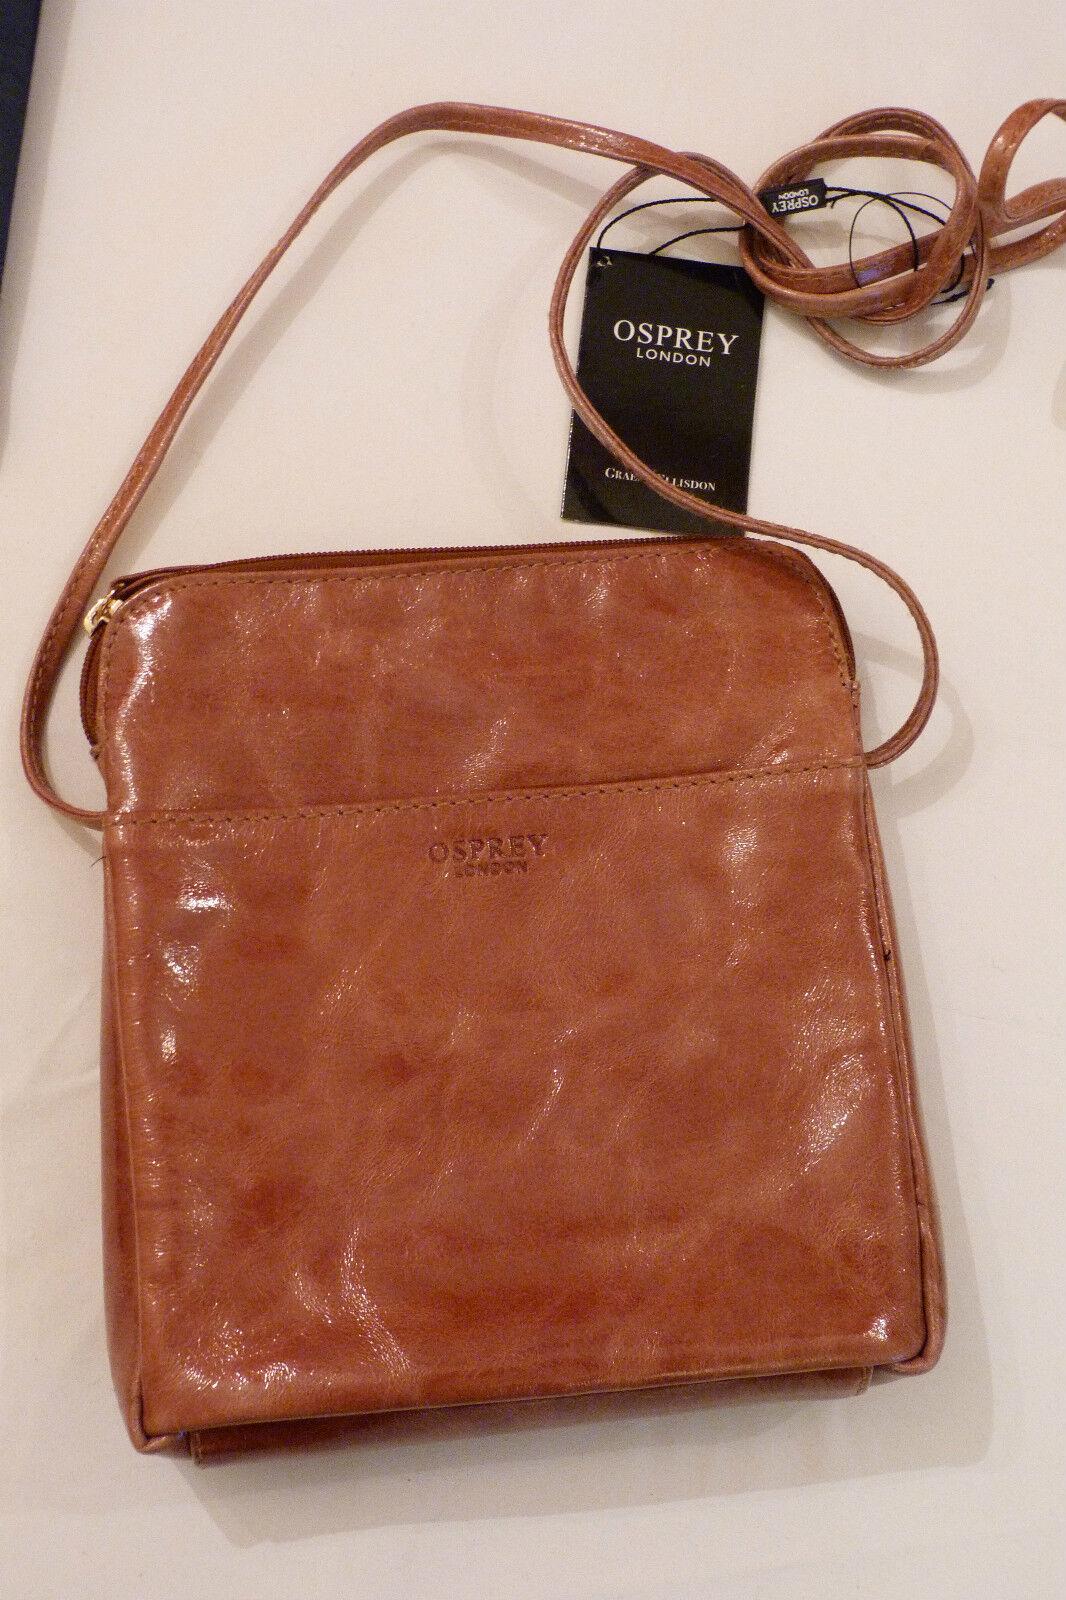 Osprey London Tan Colour Iris-splash Leather Patent Cross Body Bag ... ad19f78ed6